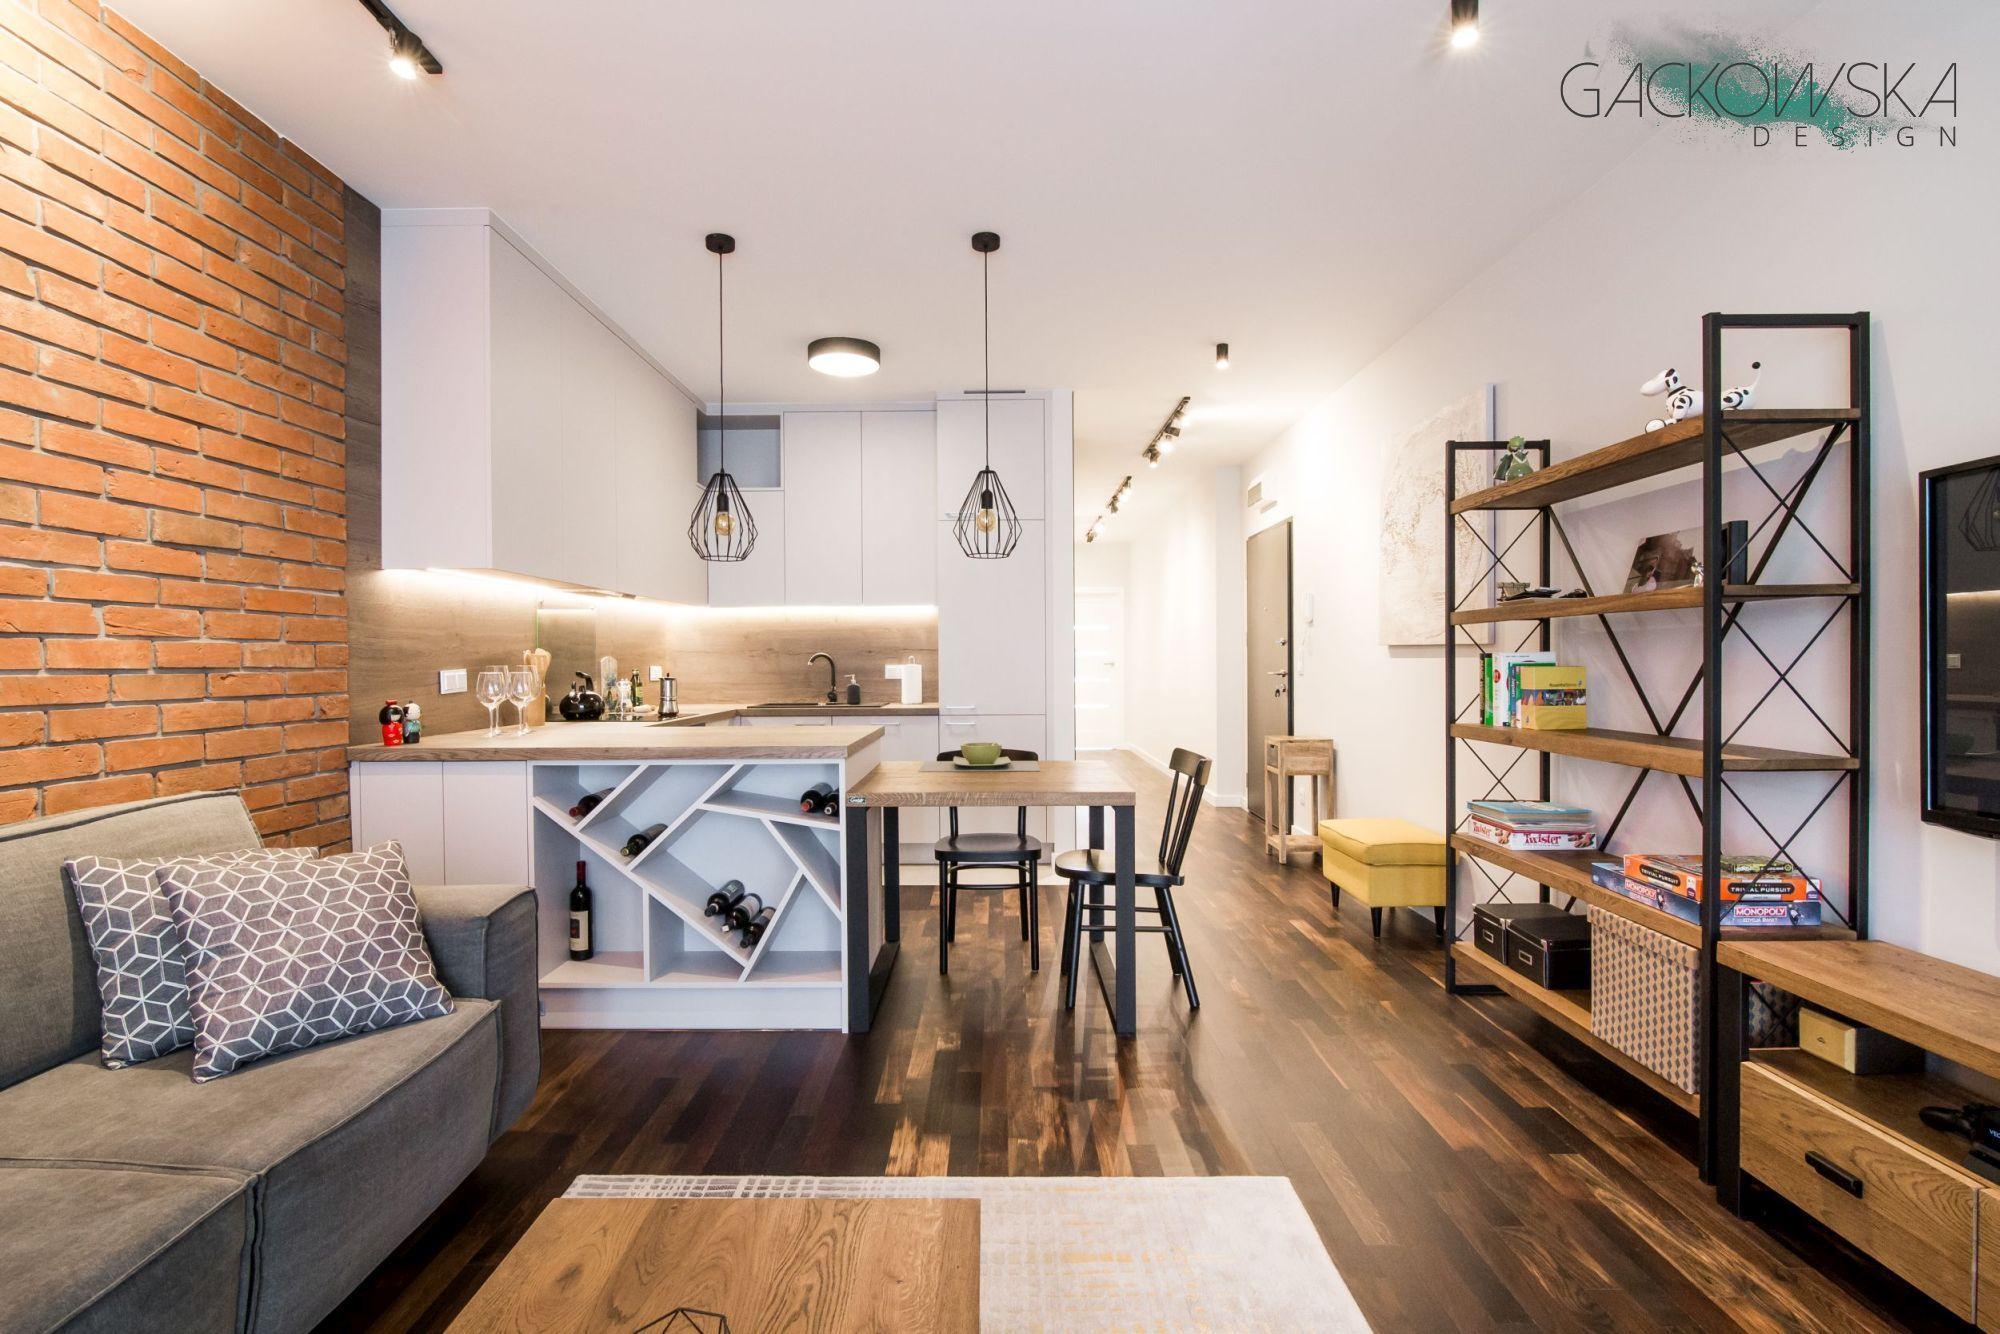 Kuchnia Z Salonem Gackowska Design Home Decor Decor Home